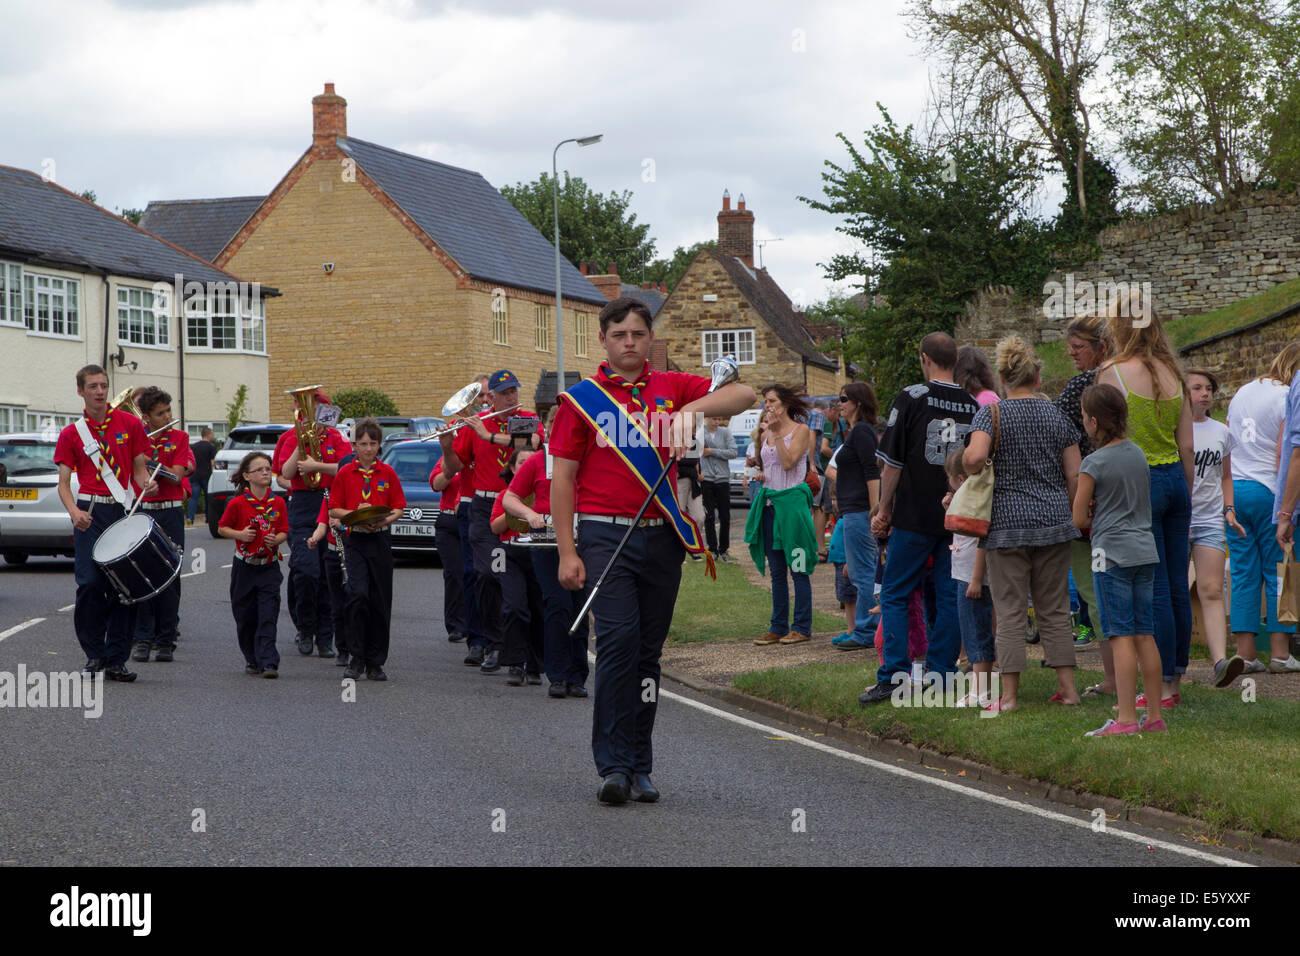 Blisworth, Northamptonshire, UK. 9th August, 2014.  The Grand Union Canal, Blisworth Canal Festival, Crowds enjoying - Stock Image